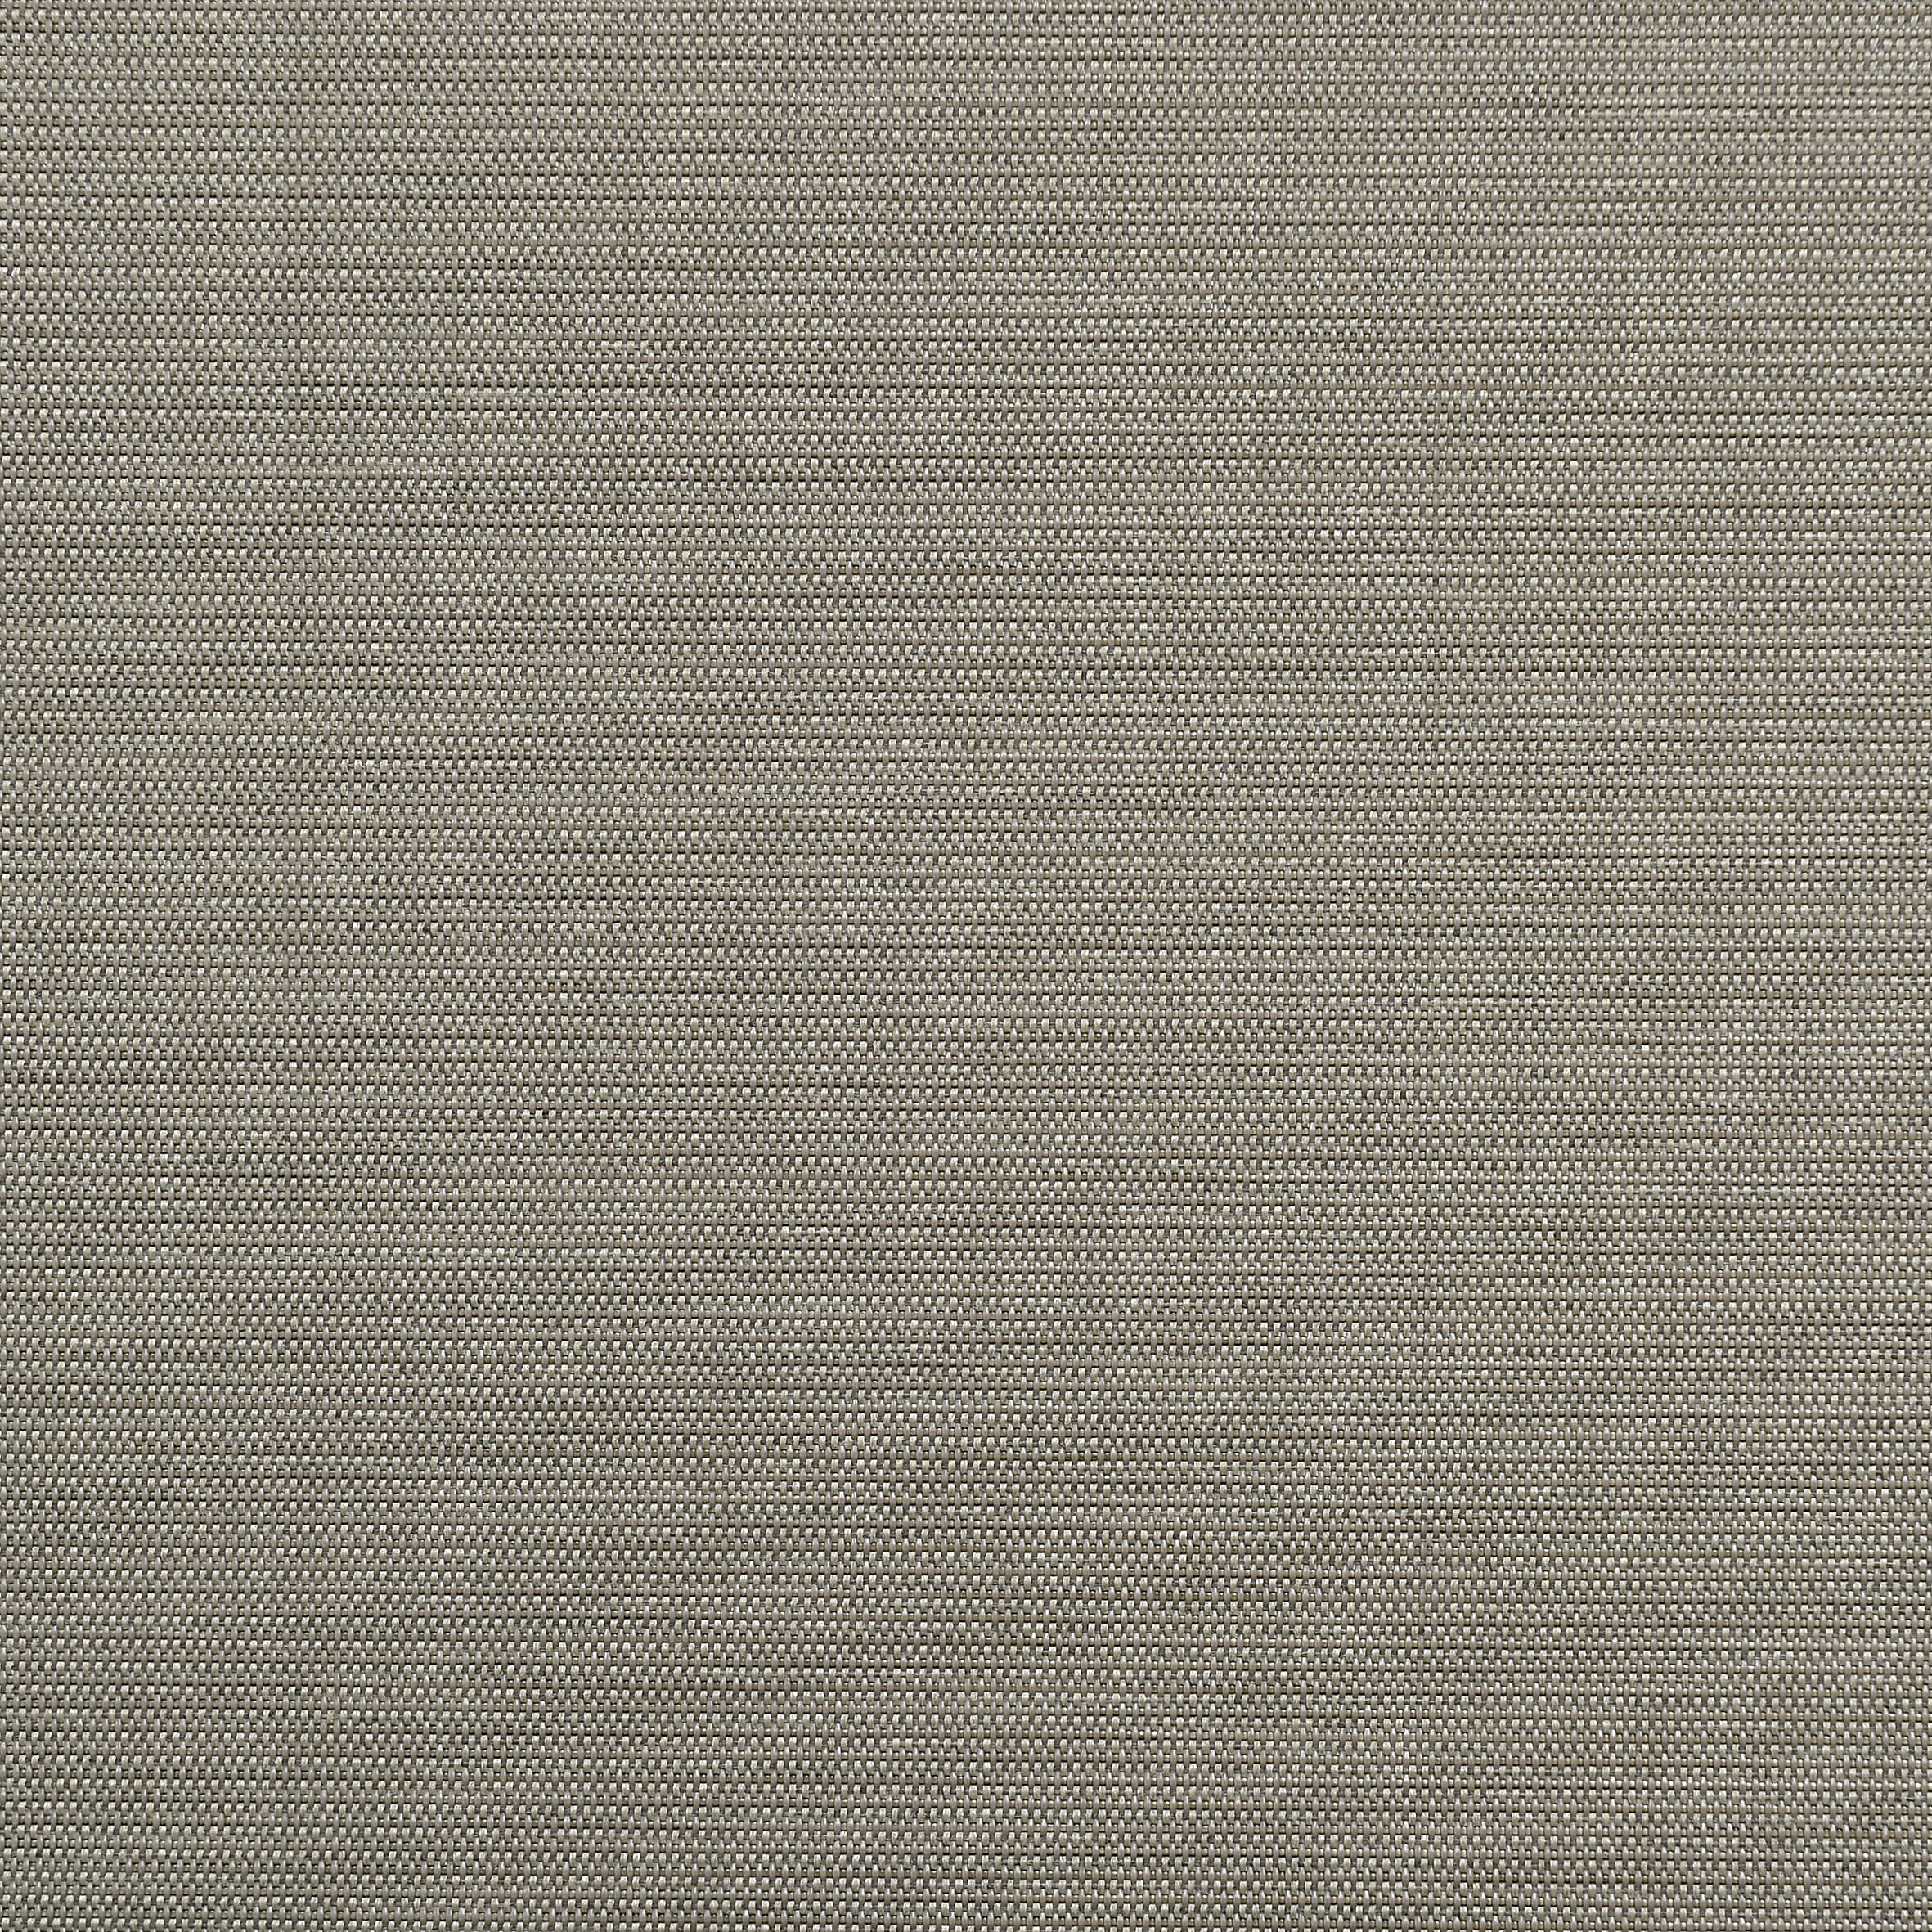 Gartenstuhl ESPANYOL (6 Stk) 03